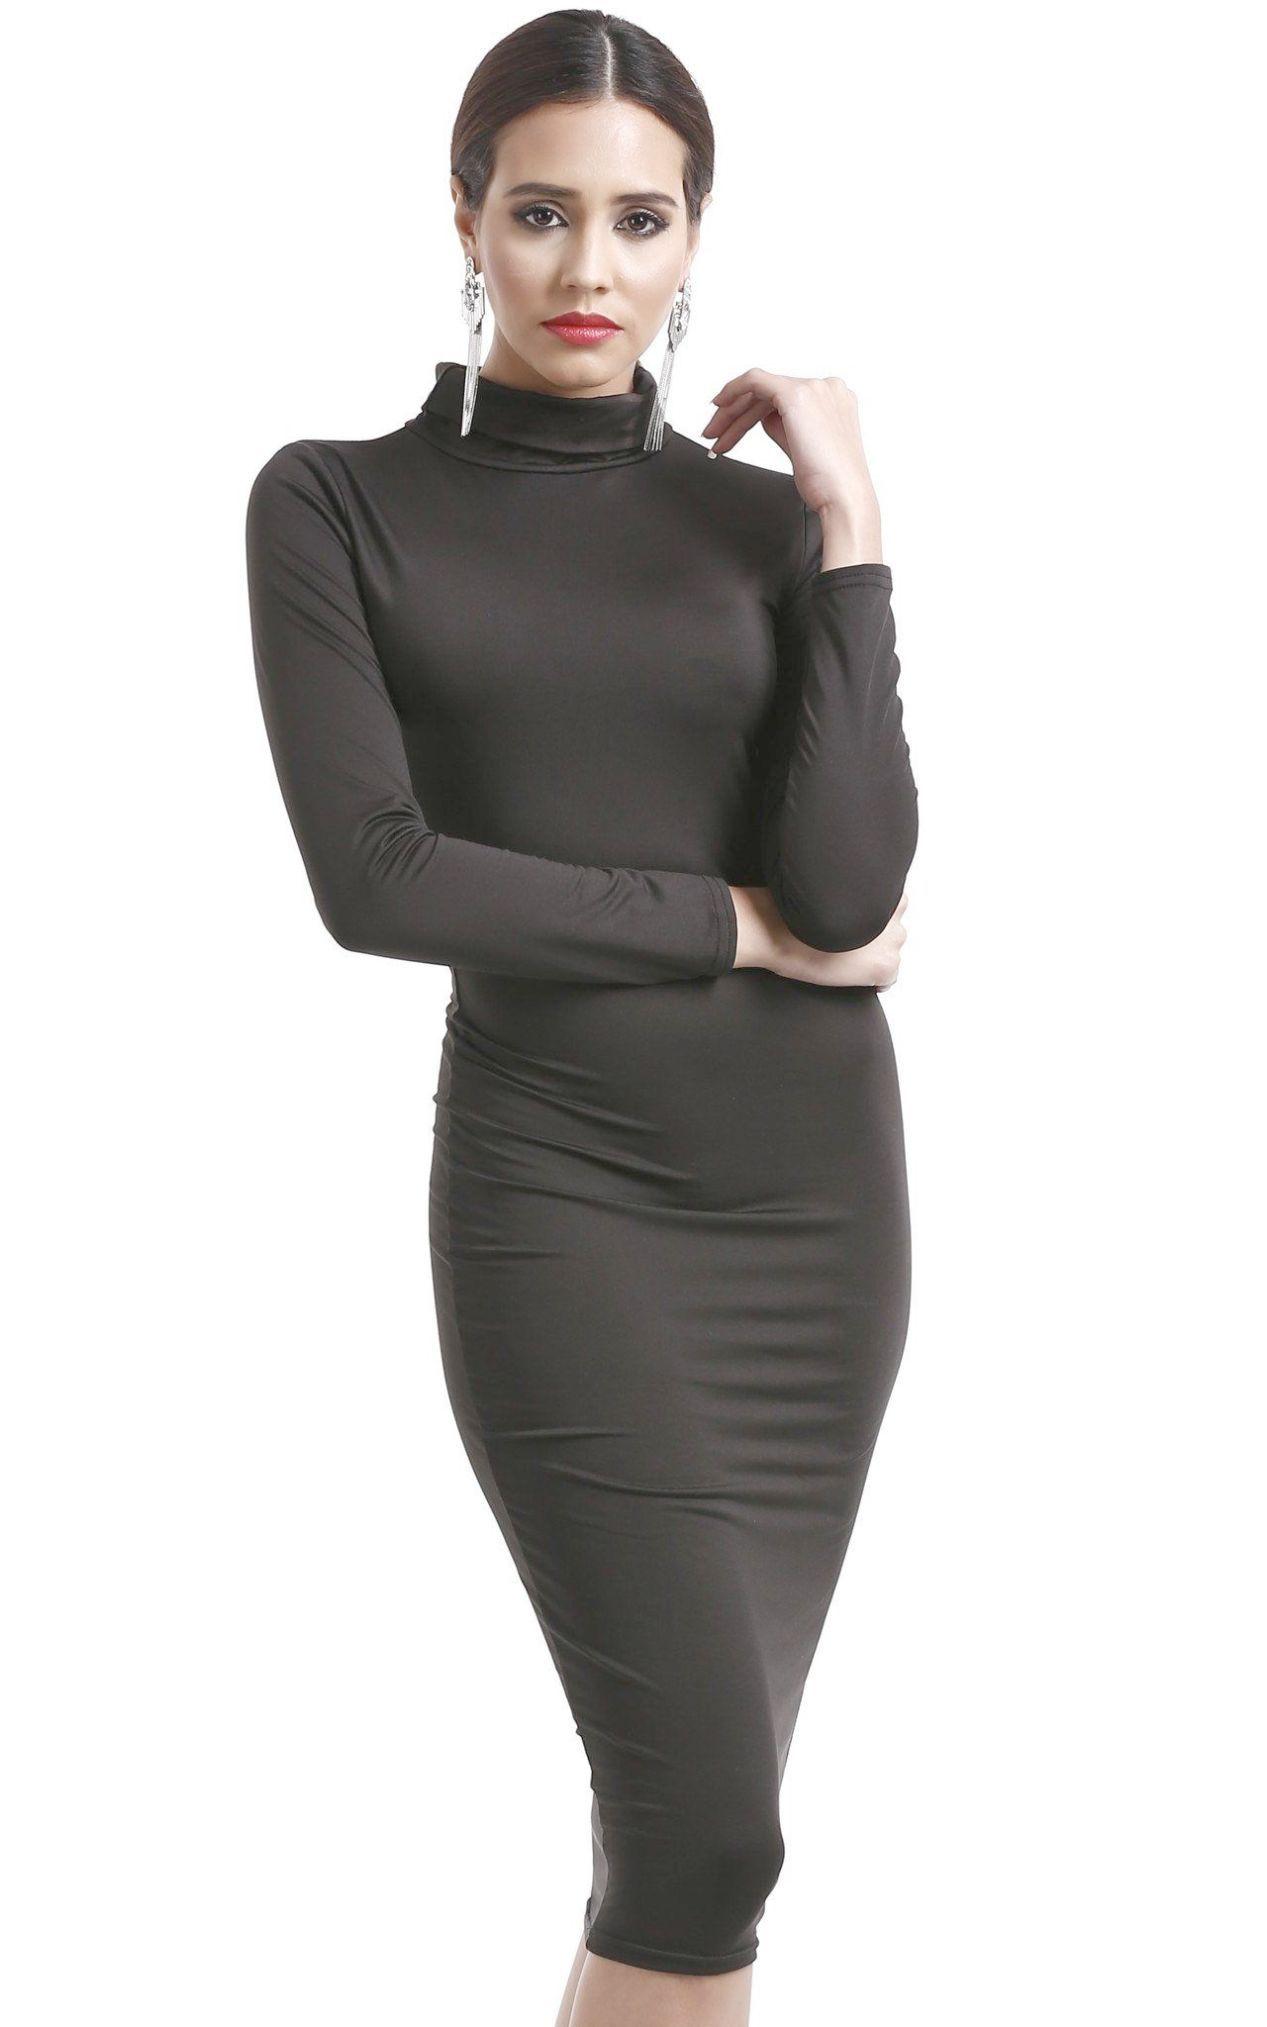 Bodycon dress debenhams fitted dress tank tight dresses cute